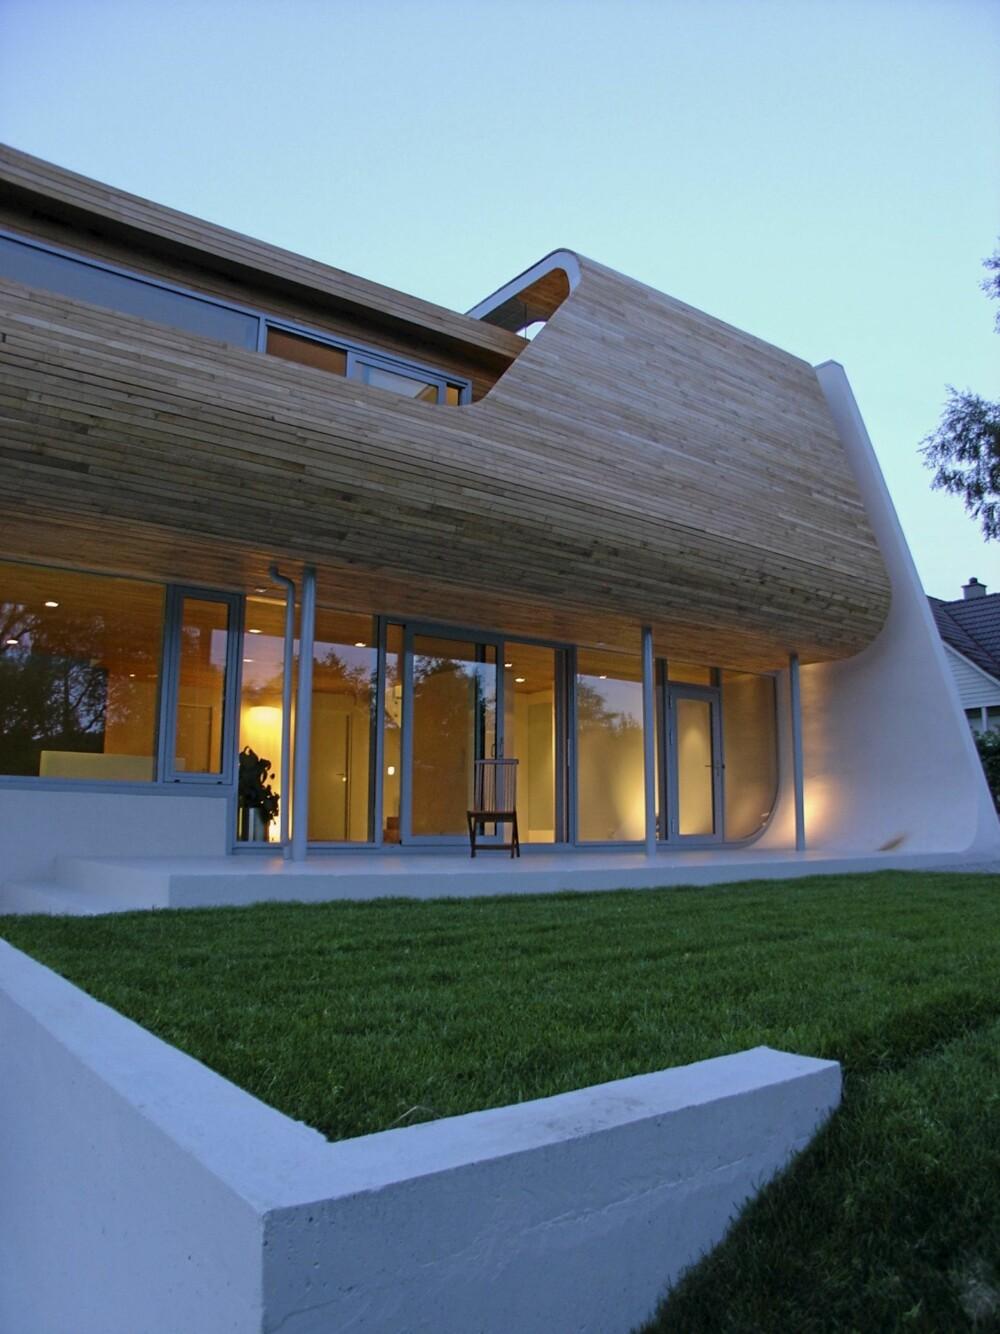 ET LYSENDE OBJEKT I HAGEN: På kvelden gløder Villa Hellearmen som en lampe.